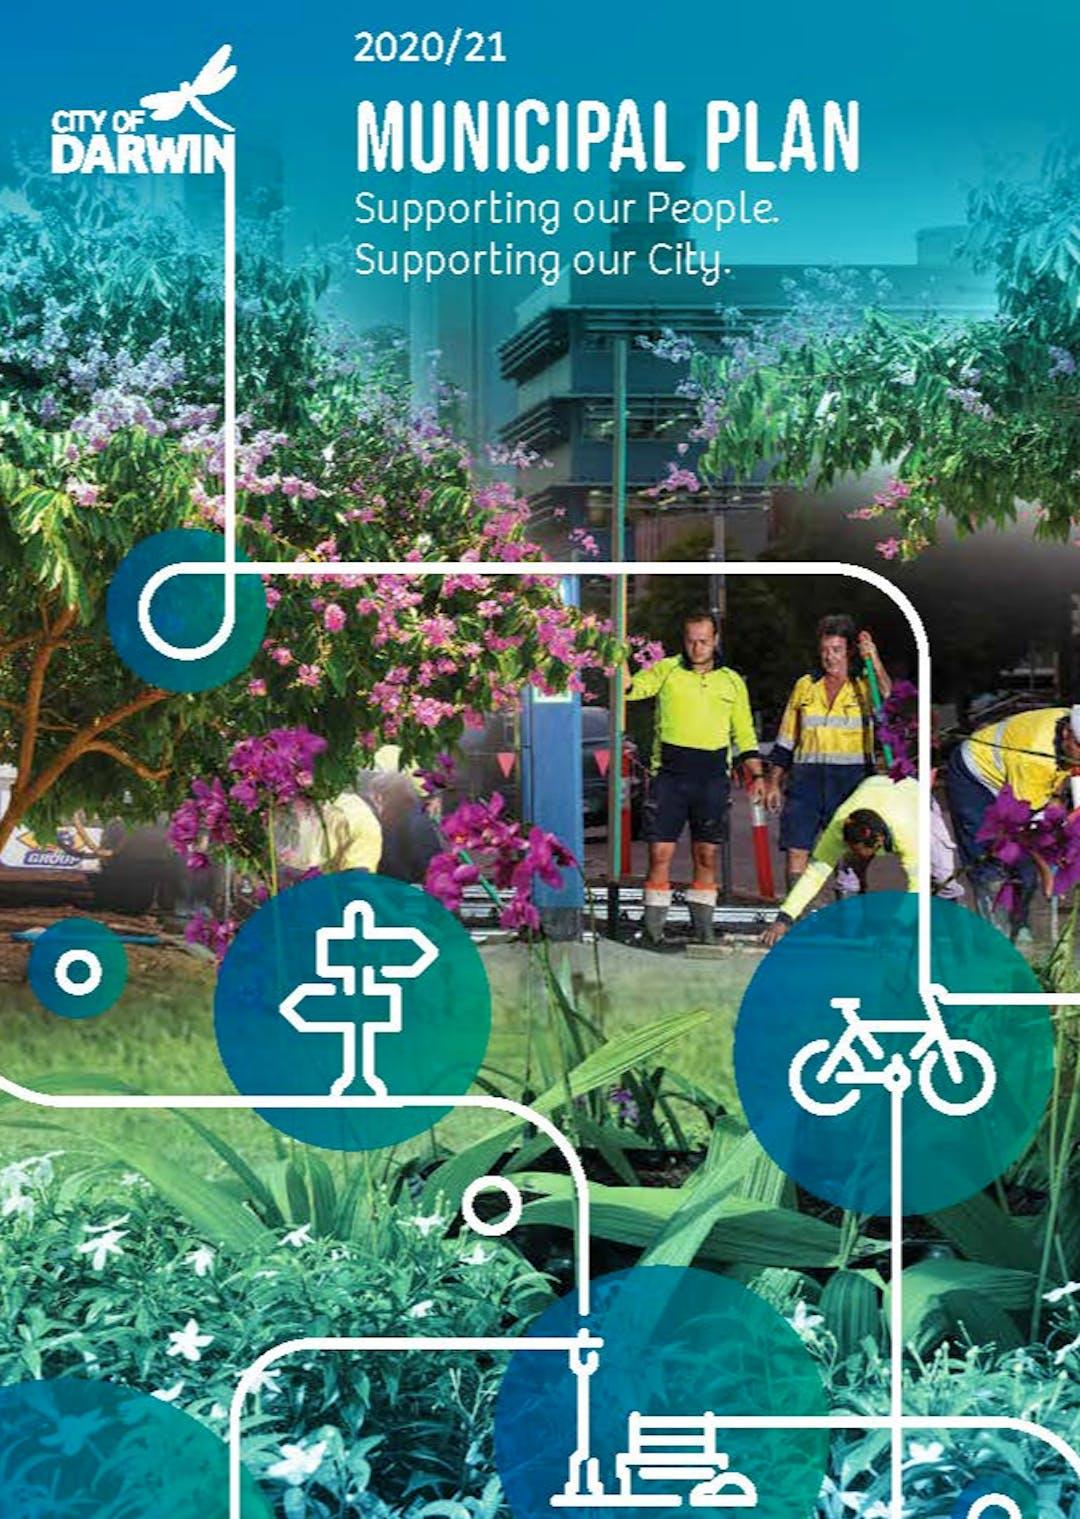 2020/21 Draft Municipal Plan front cover